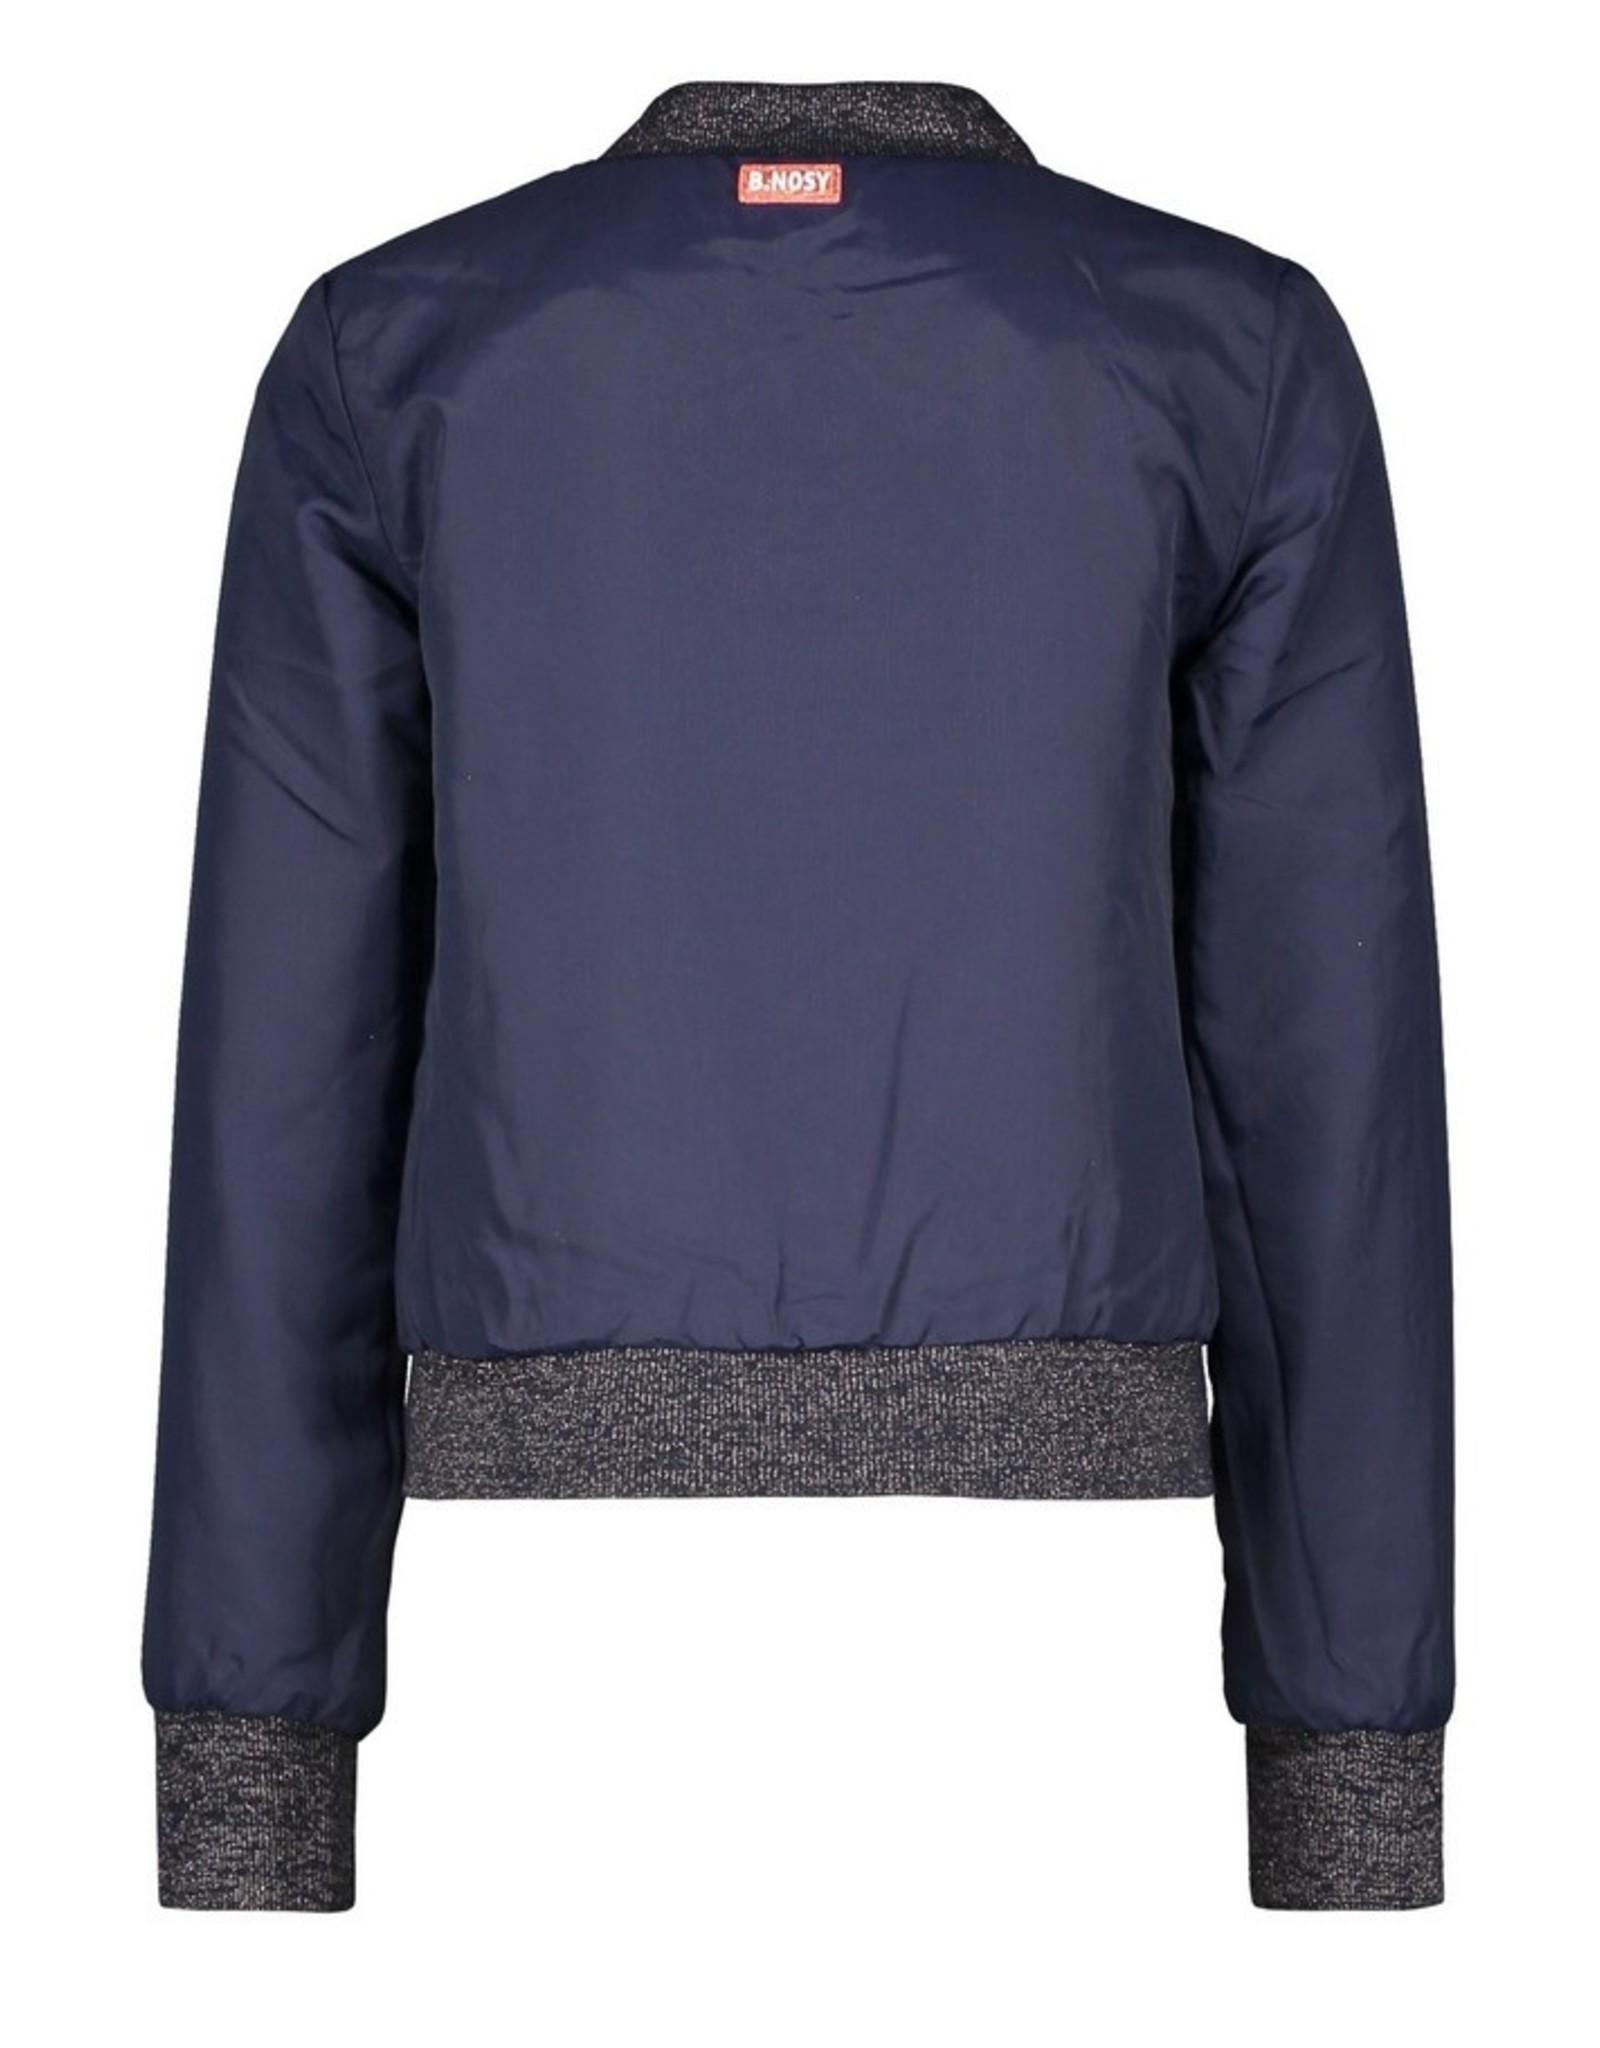 B.Nosy B.Nosy Girls Reversible Jacket Pewter